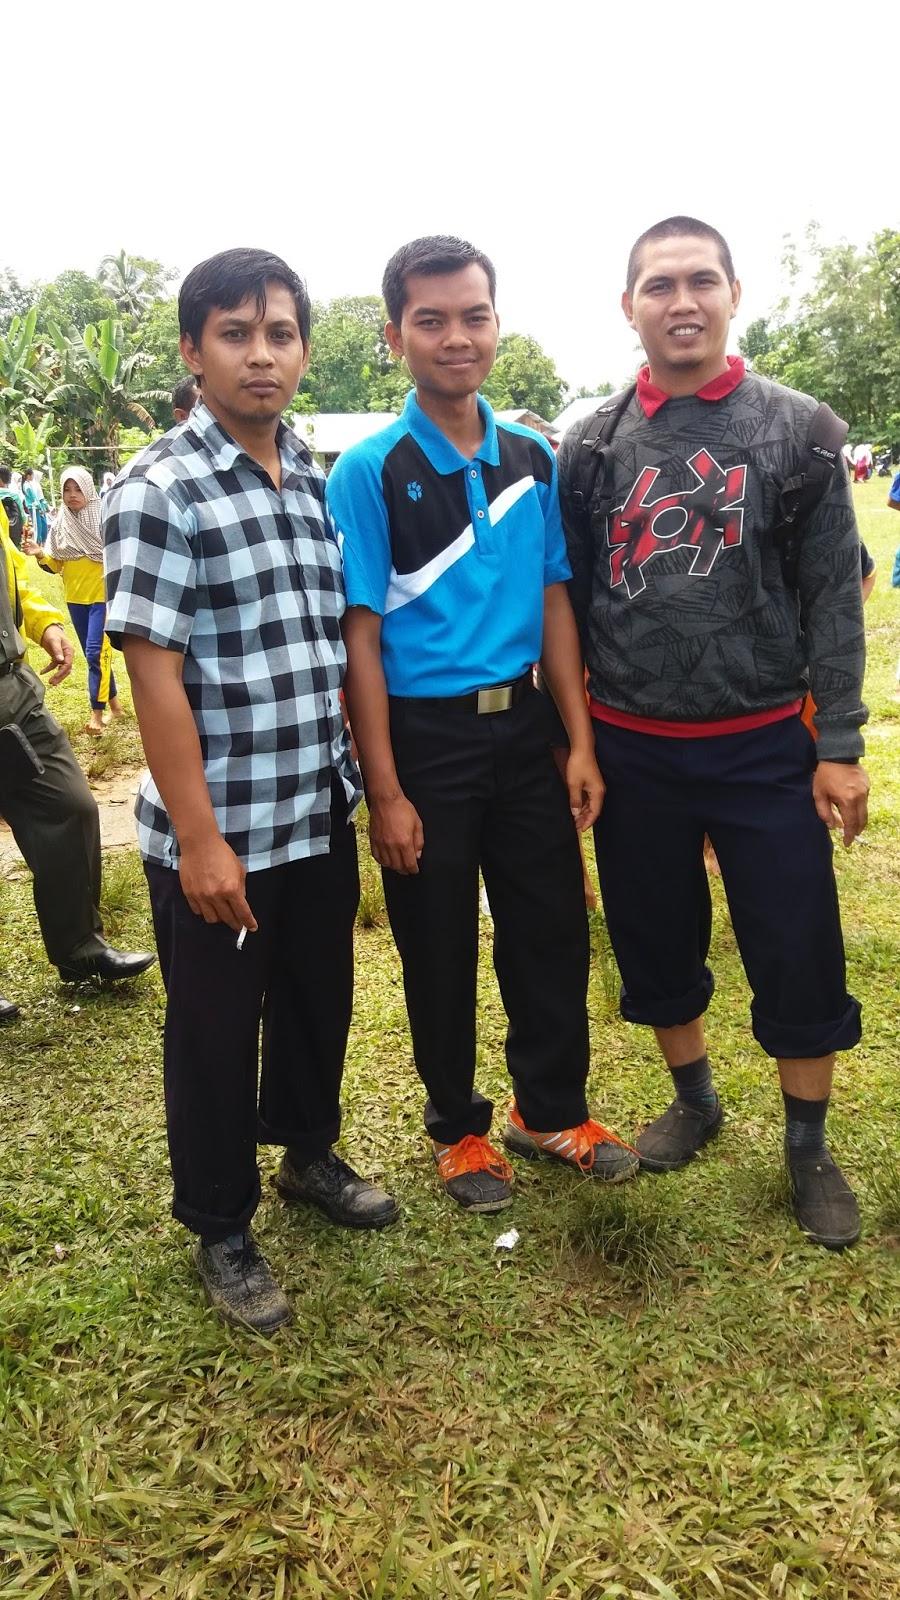 Sdn 2 Pasar Batu Ikut Berpartisipasi Dalam Seleksi O2sn Tingkat Kecamatan Tahun 2016 Sdn 2